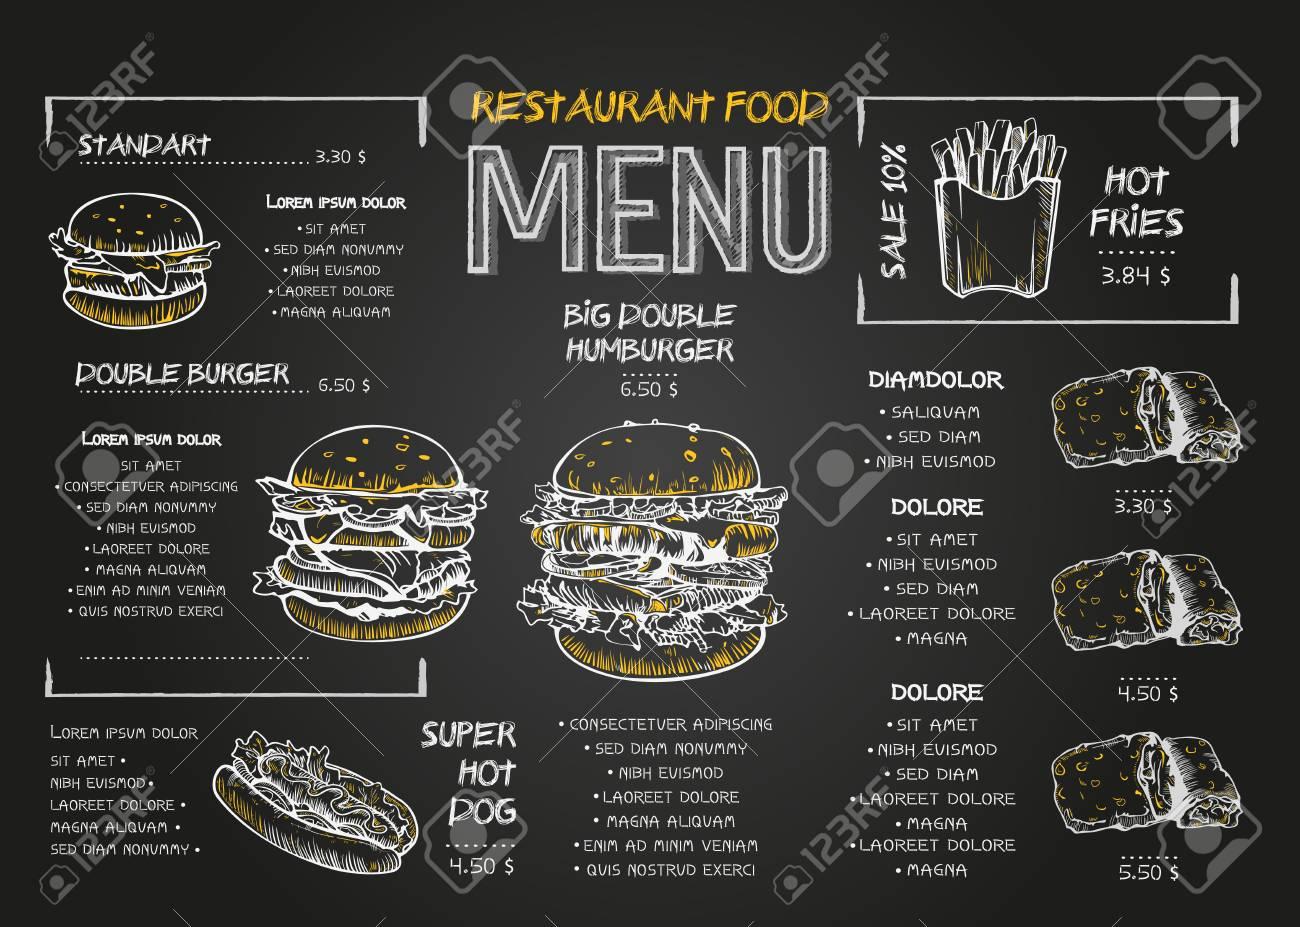 Restaurant Food Menu Design template with Chalkboard Background. Vintage chalk drawing fast food menu in vector sketch style. - 120842829